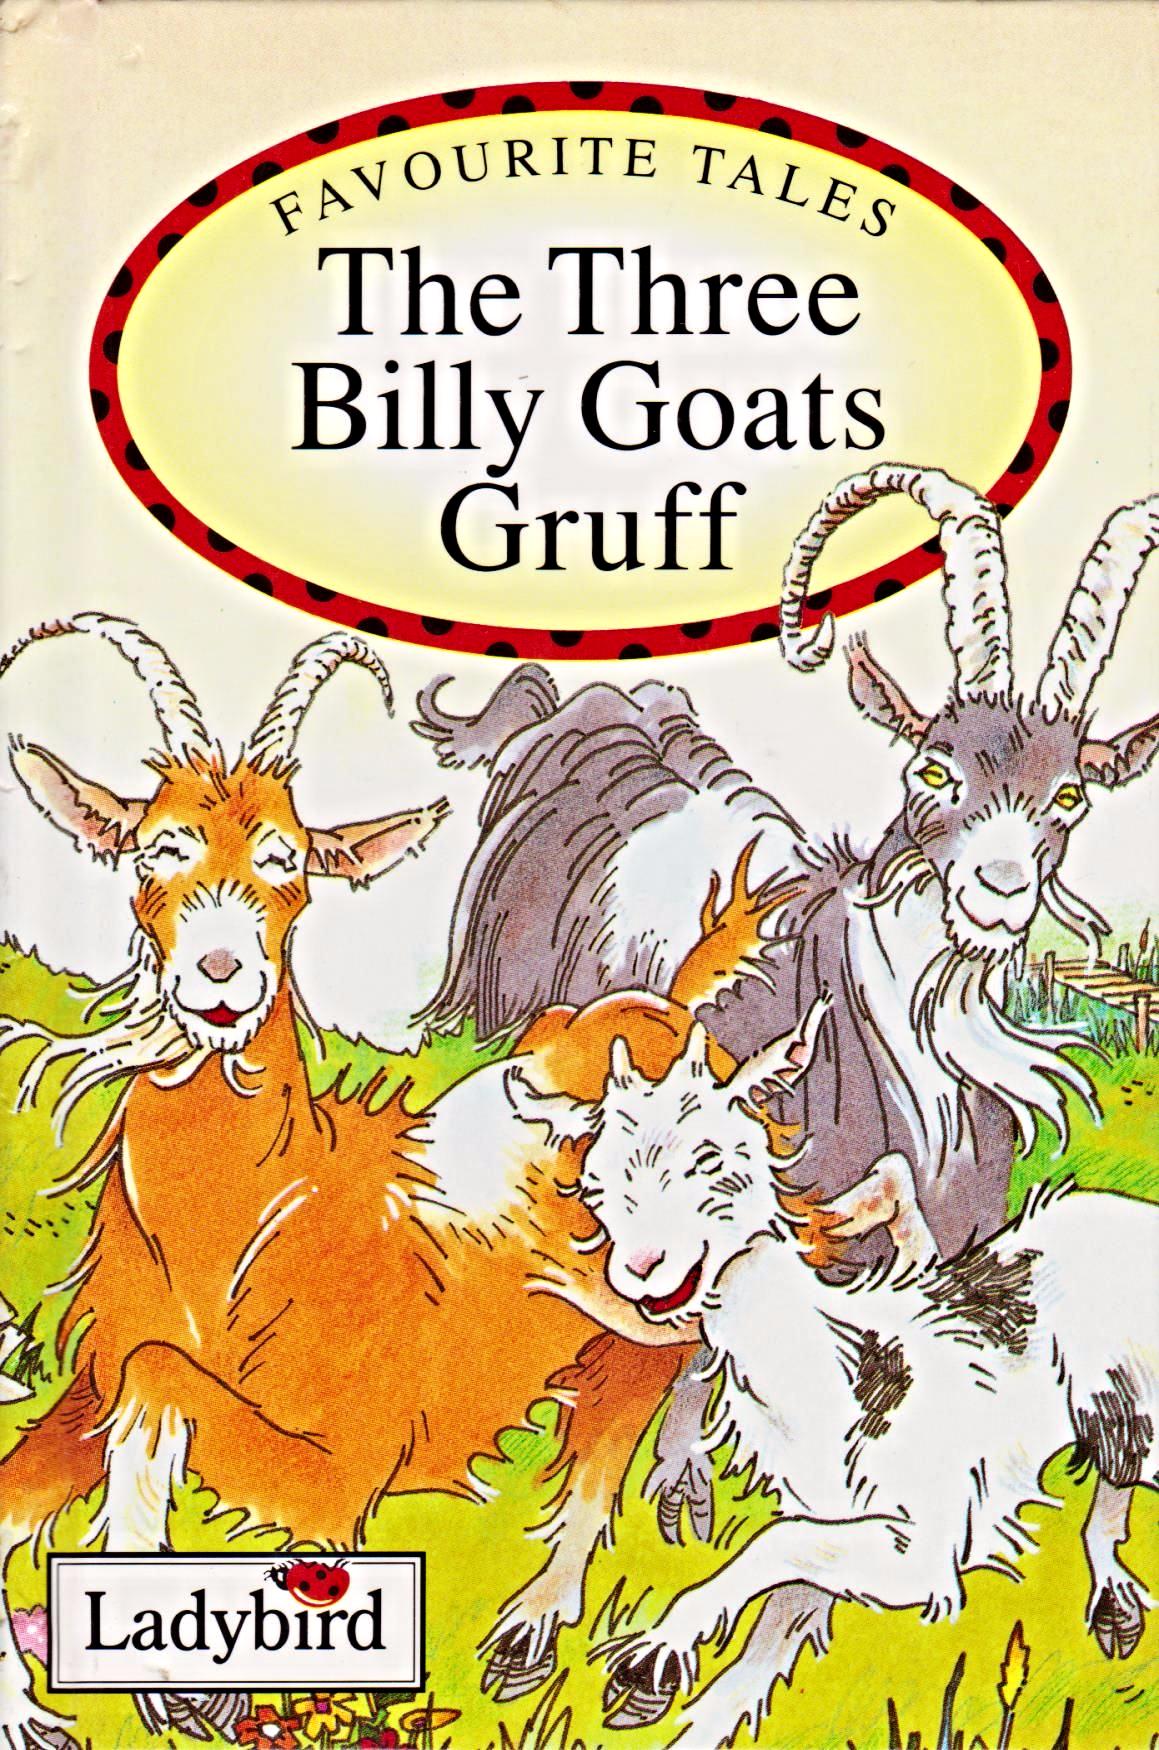 Three Billy Goats Gruff PNG - 65704